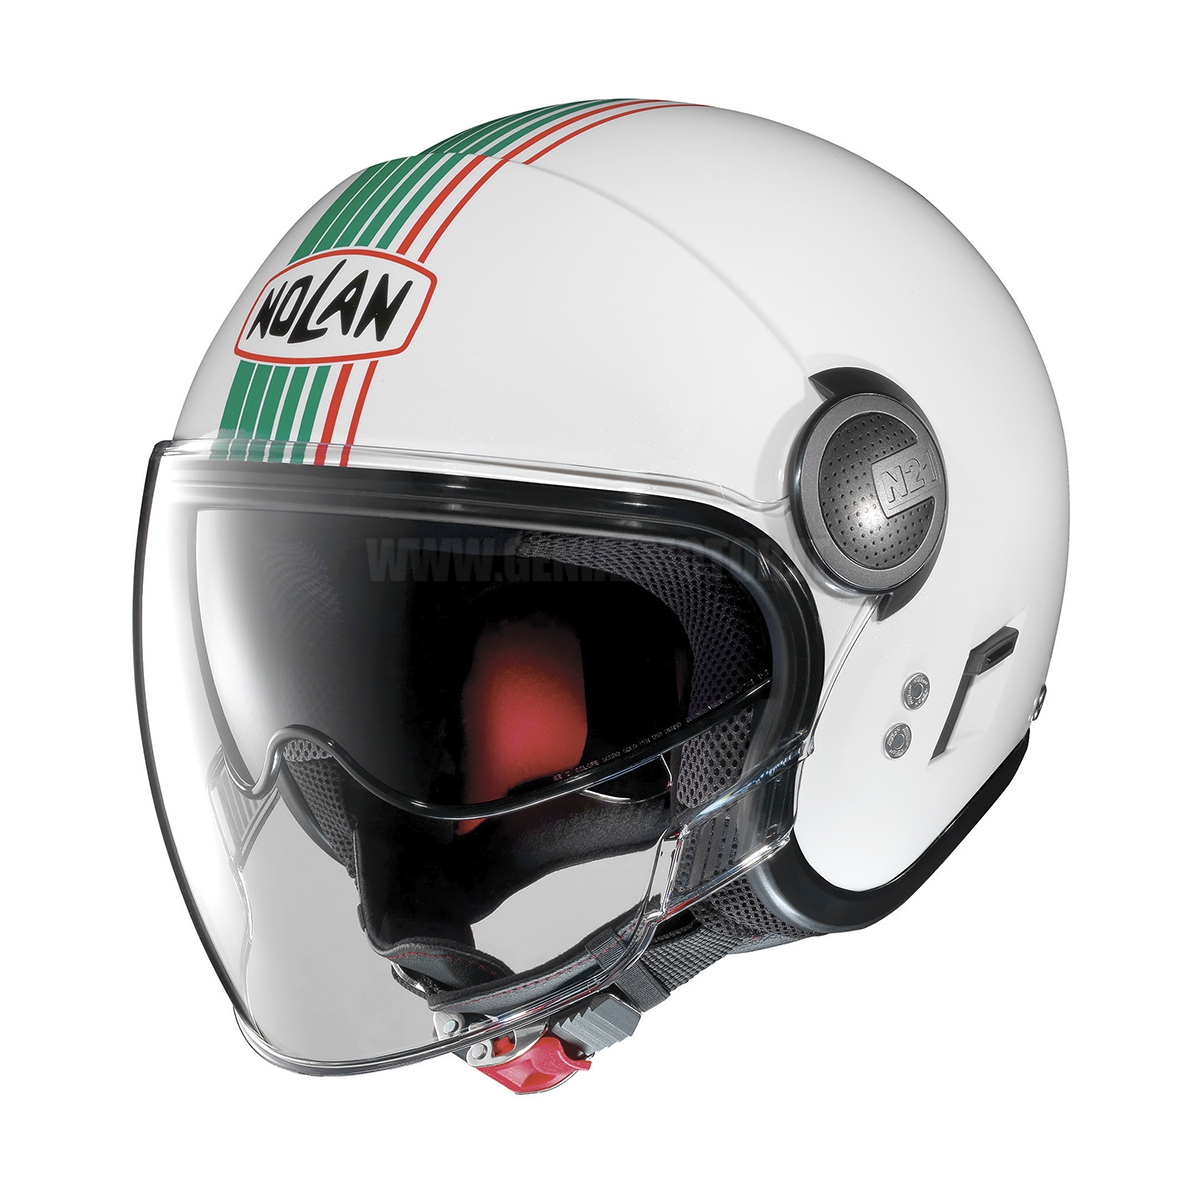 CASCO NOLAN N21 VISOR JOIE DE VI 043 METAL WHITE